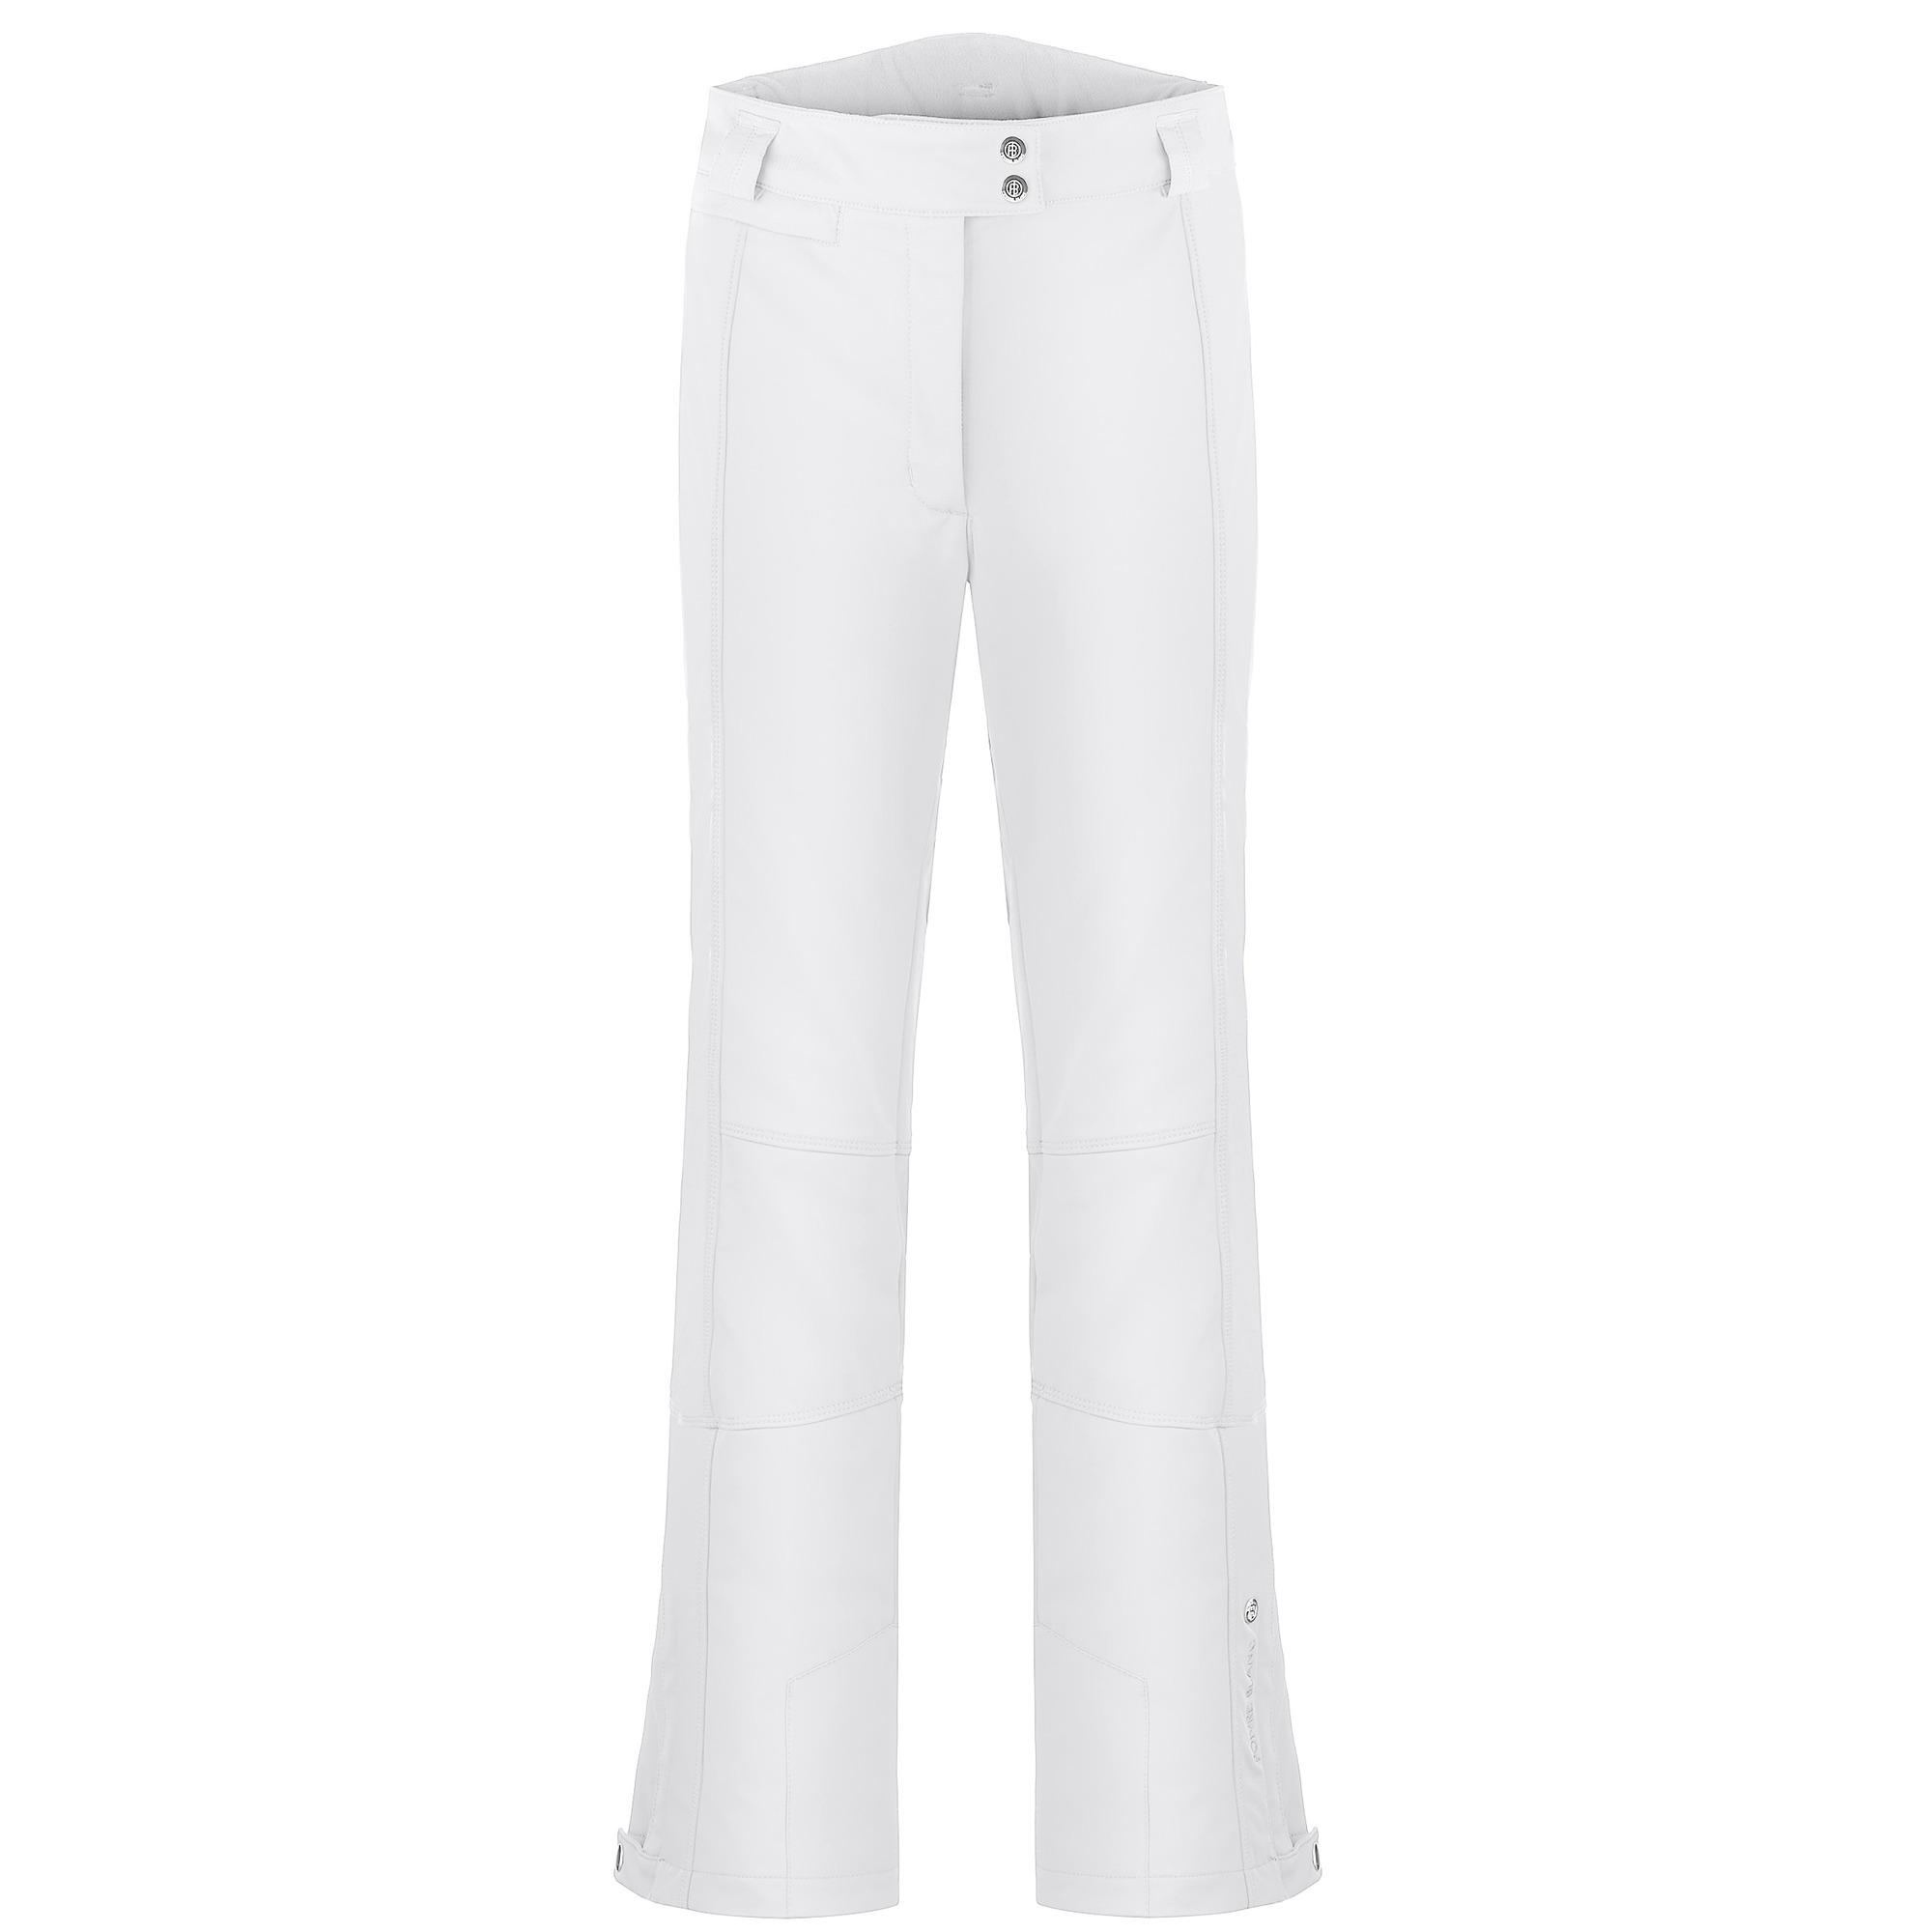 7310af06d6 Poivre Blanc női strech sínadrág, white - Tormasport